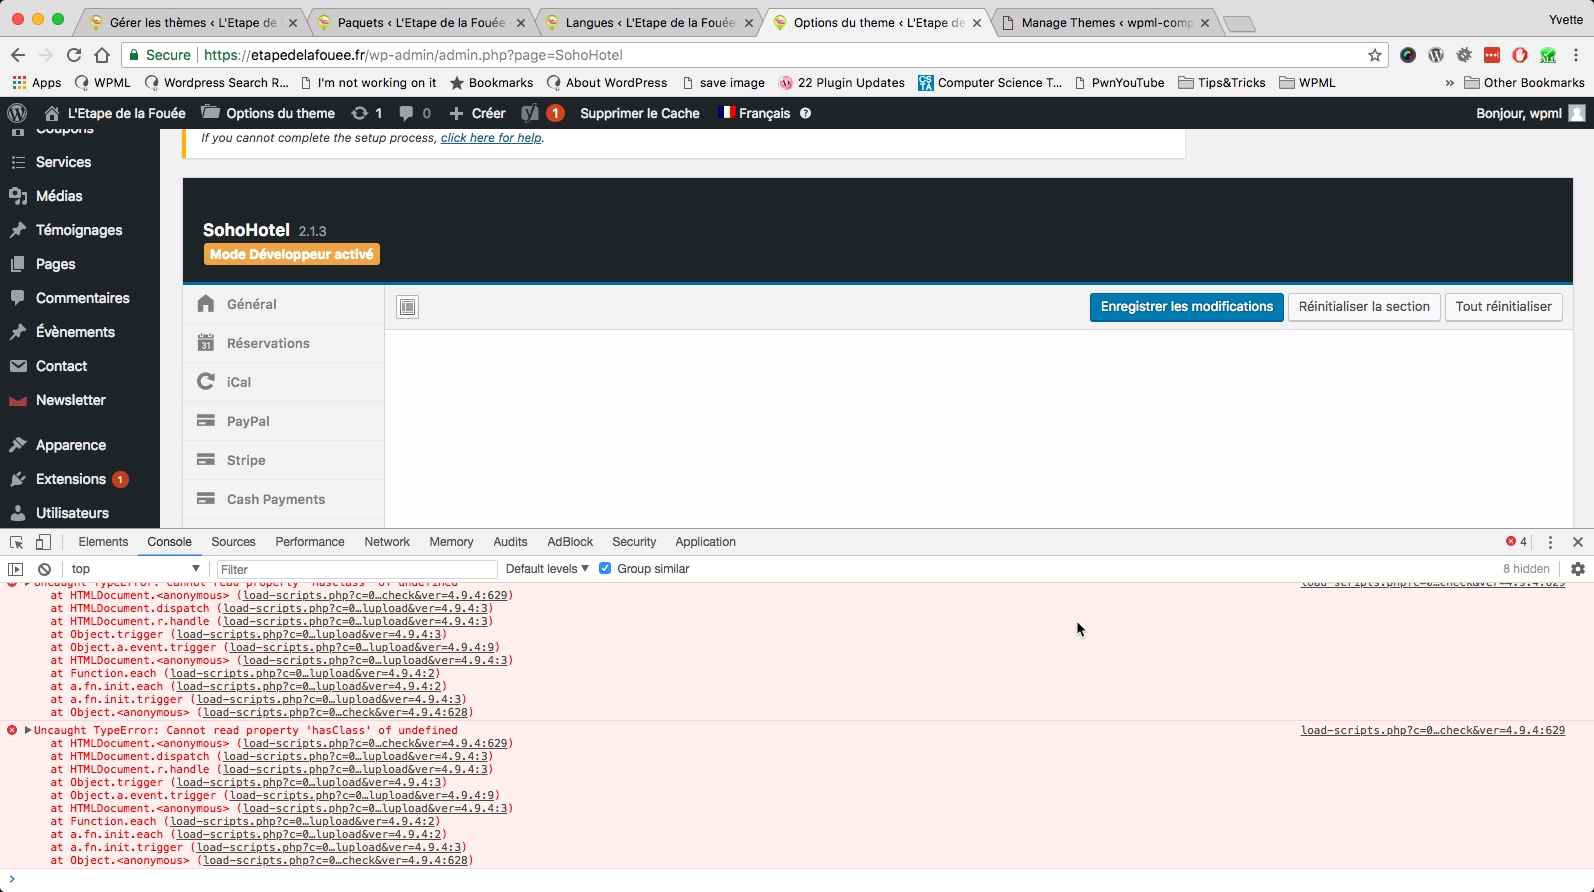 JavascriptErrorsFromTheme.png